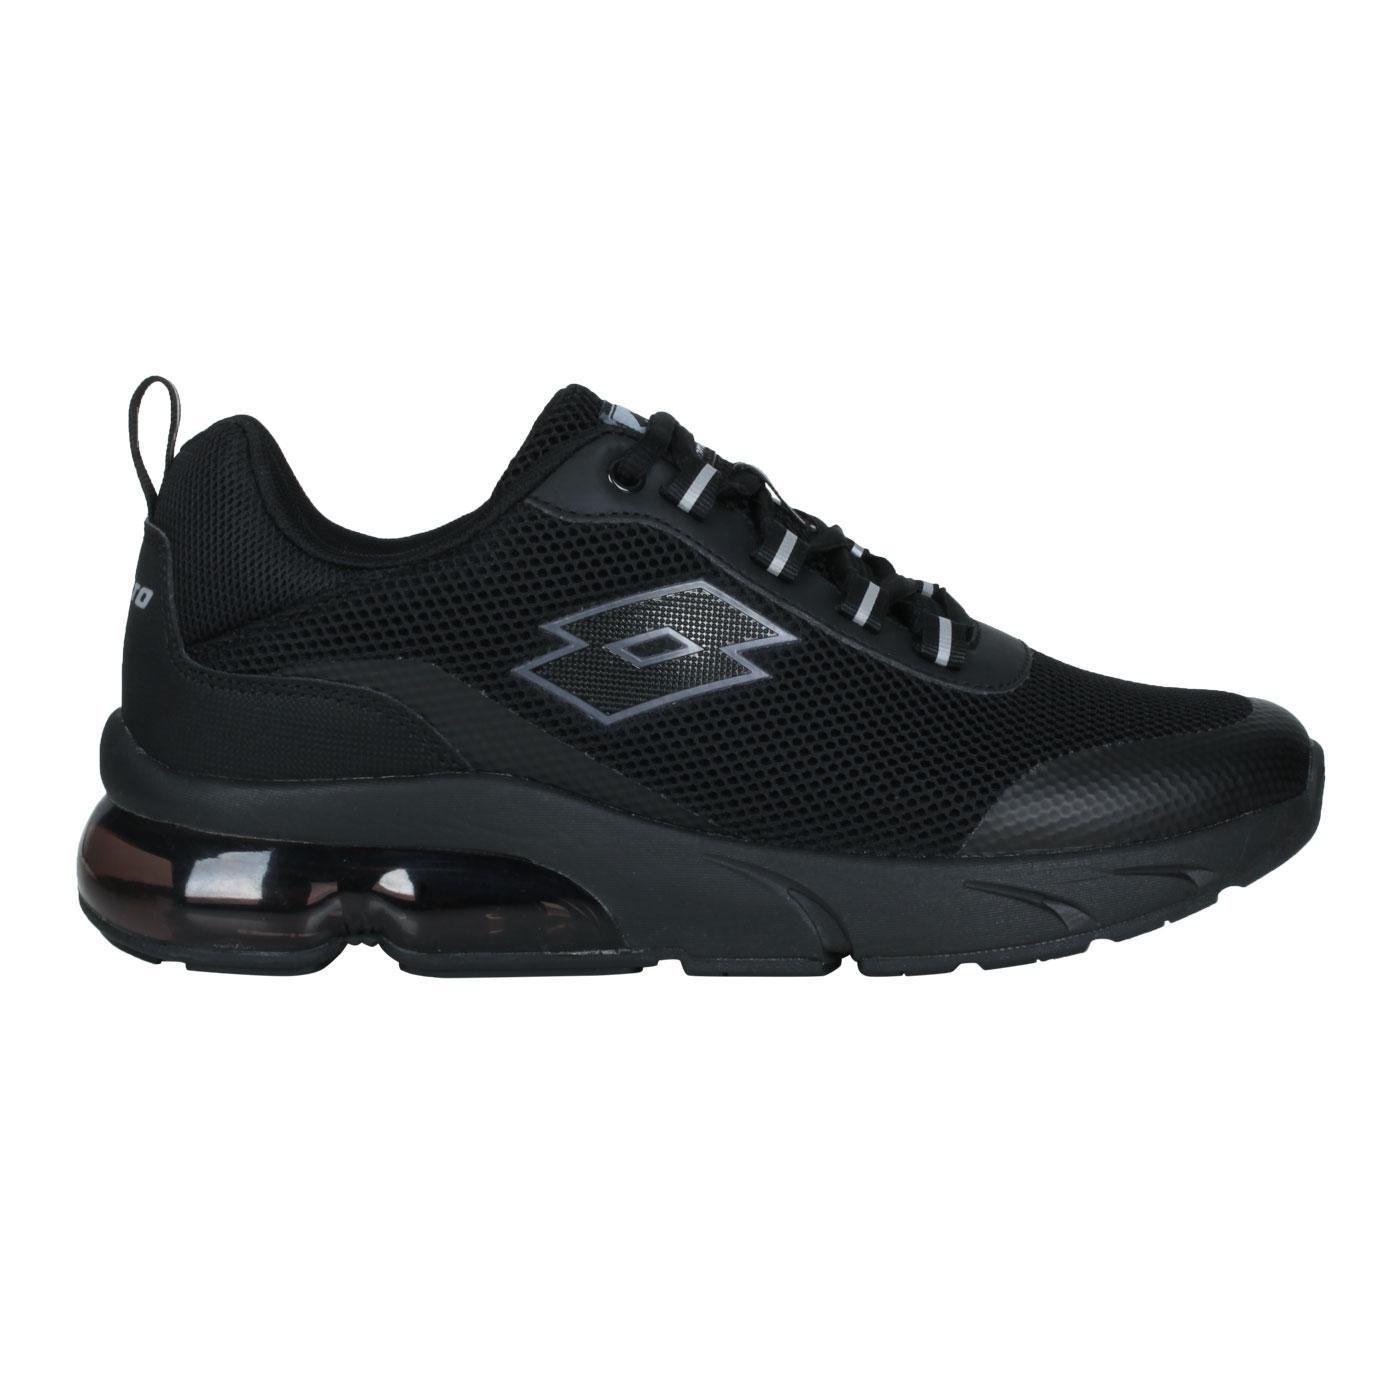 LOTTO 男款AERO POWER II運動鞋 LT1AMR3890